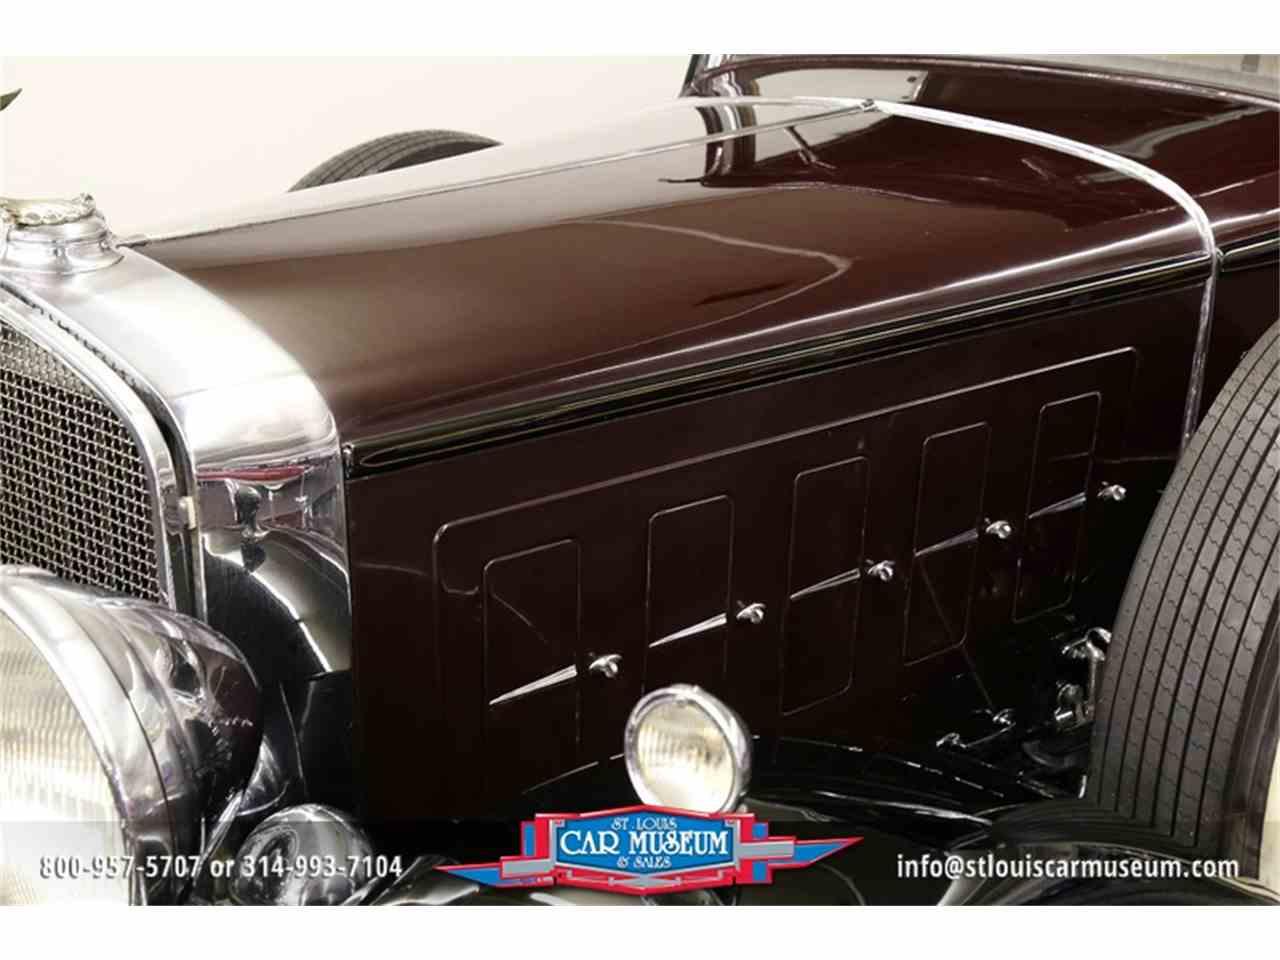 Large Picture of 1931 Cadillac V-16 Madam X Landau Sedan - $374,900.00 Offered by St. Louis Car Museum - JSU3